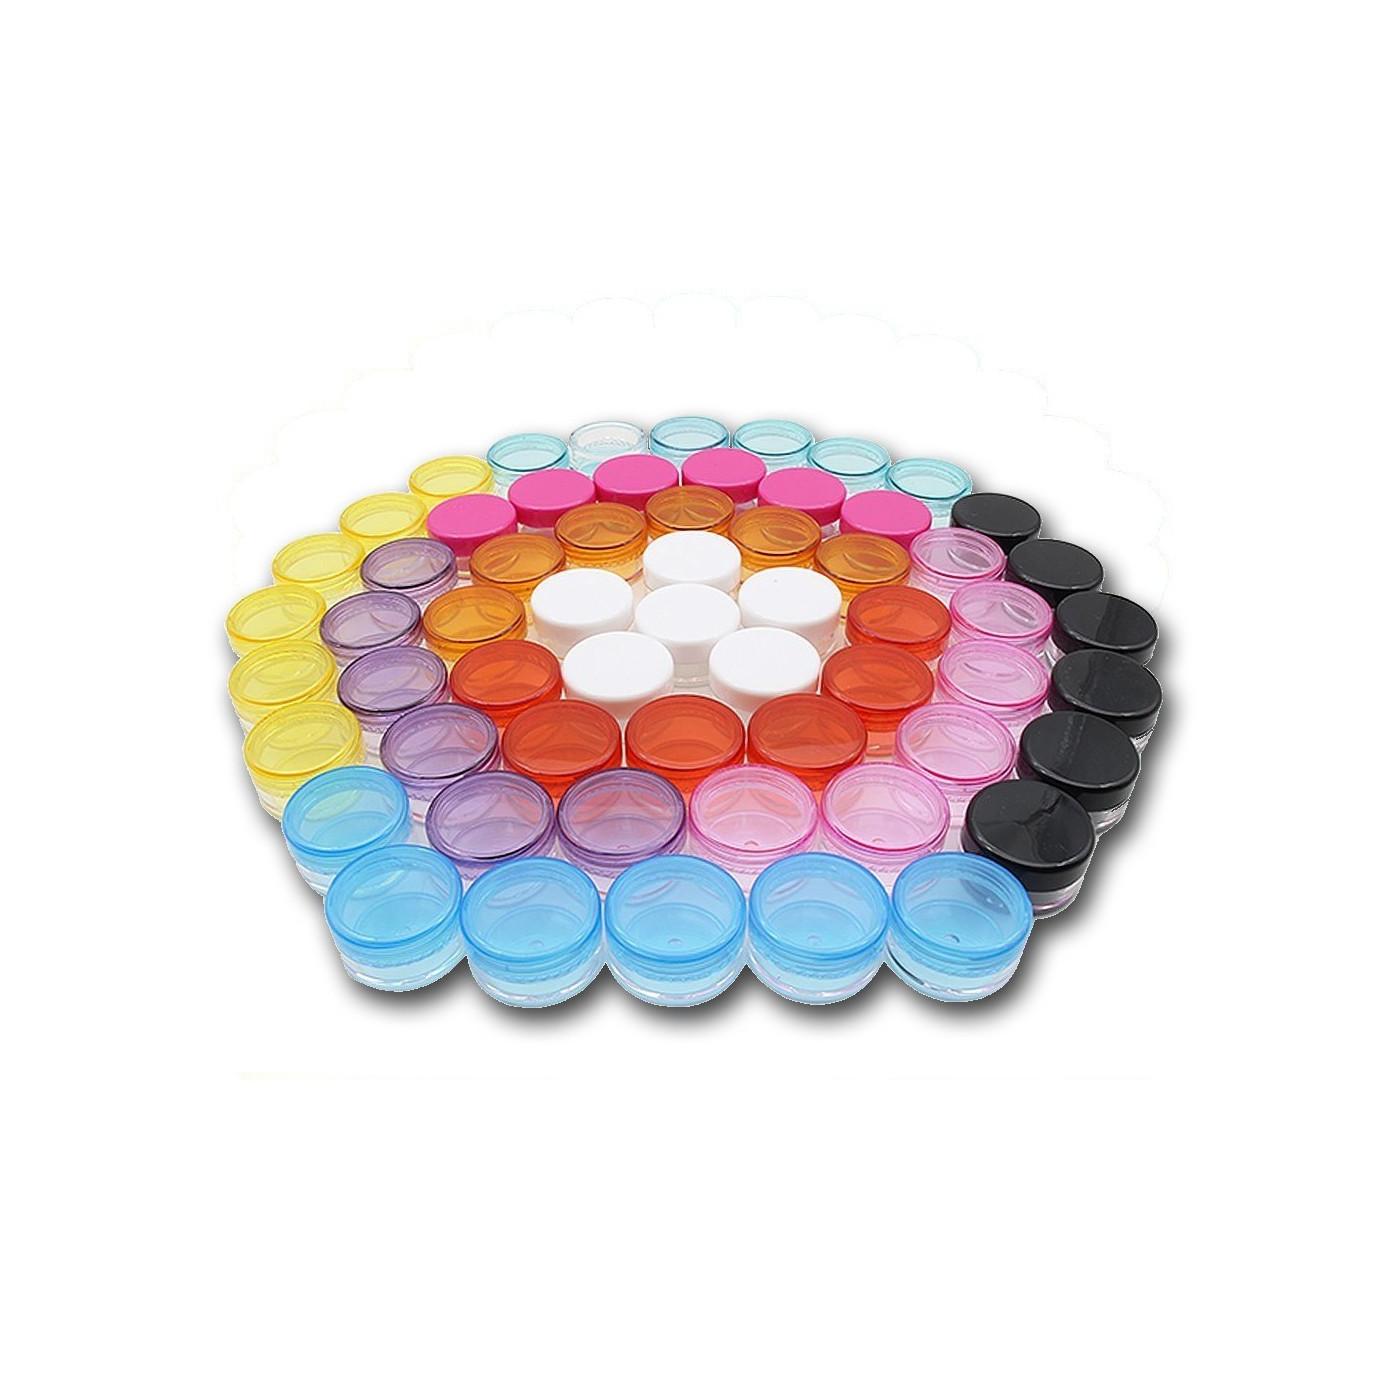 Set of 20 plastic colored jars with screw cap, 3 ml